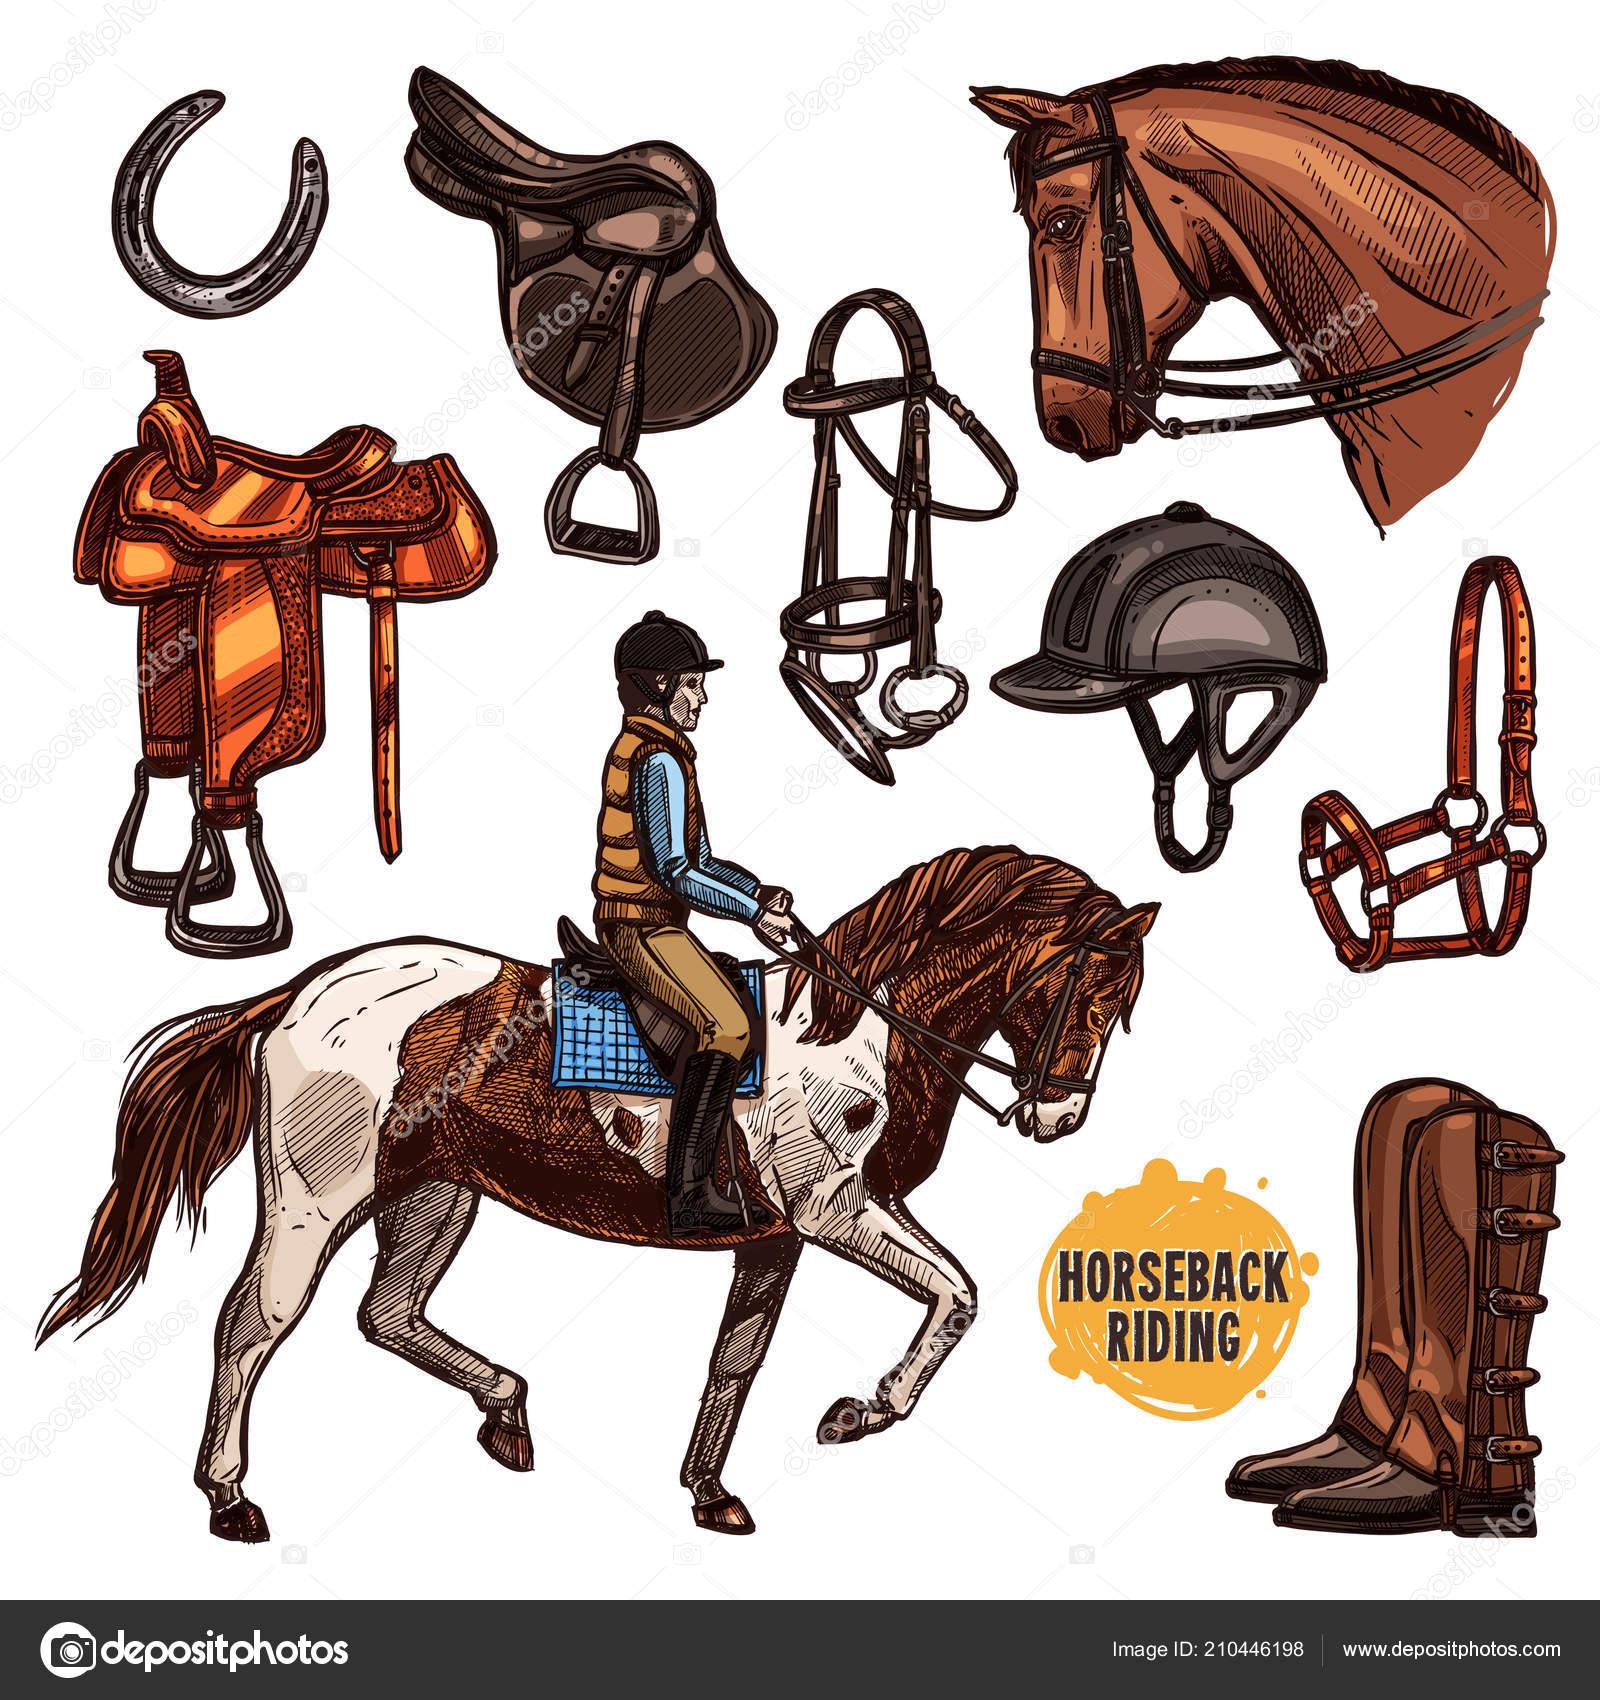 Design Horse Riding Poster Hand Drawn Horse Sketch Illustration Riding Stock Vector C Alexrockheart 210446198